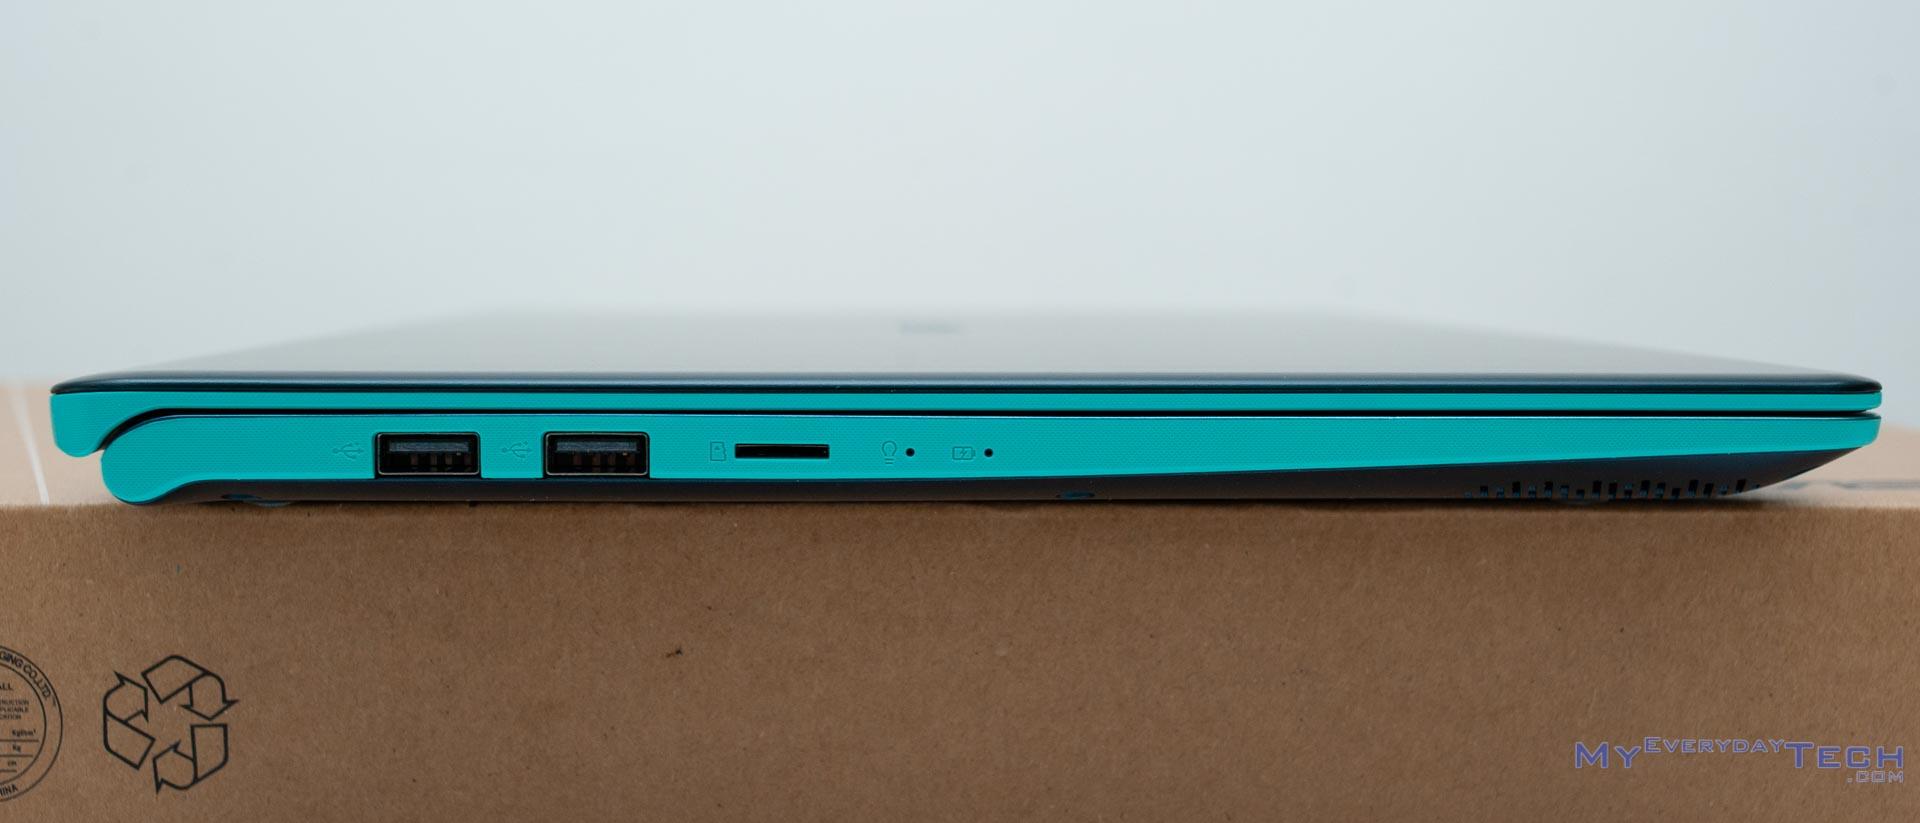 ASUS VivoBook S15 S530U (i5, 256GB)